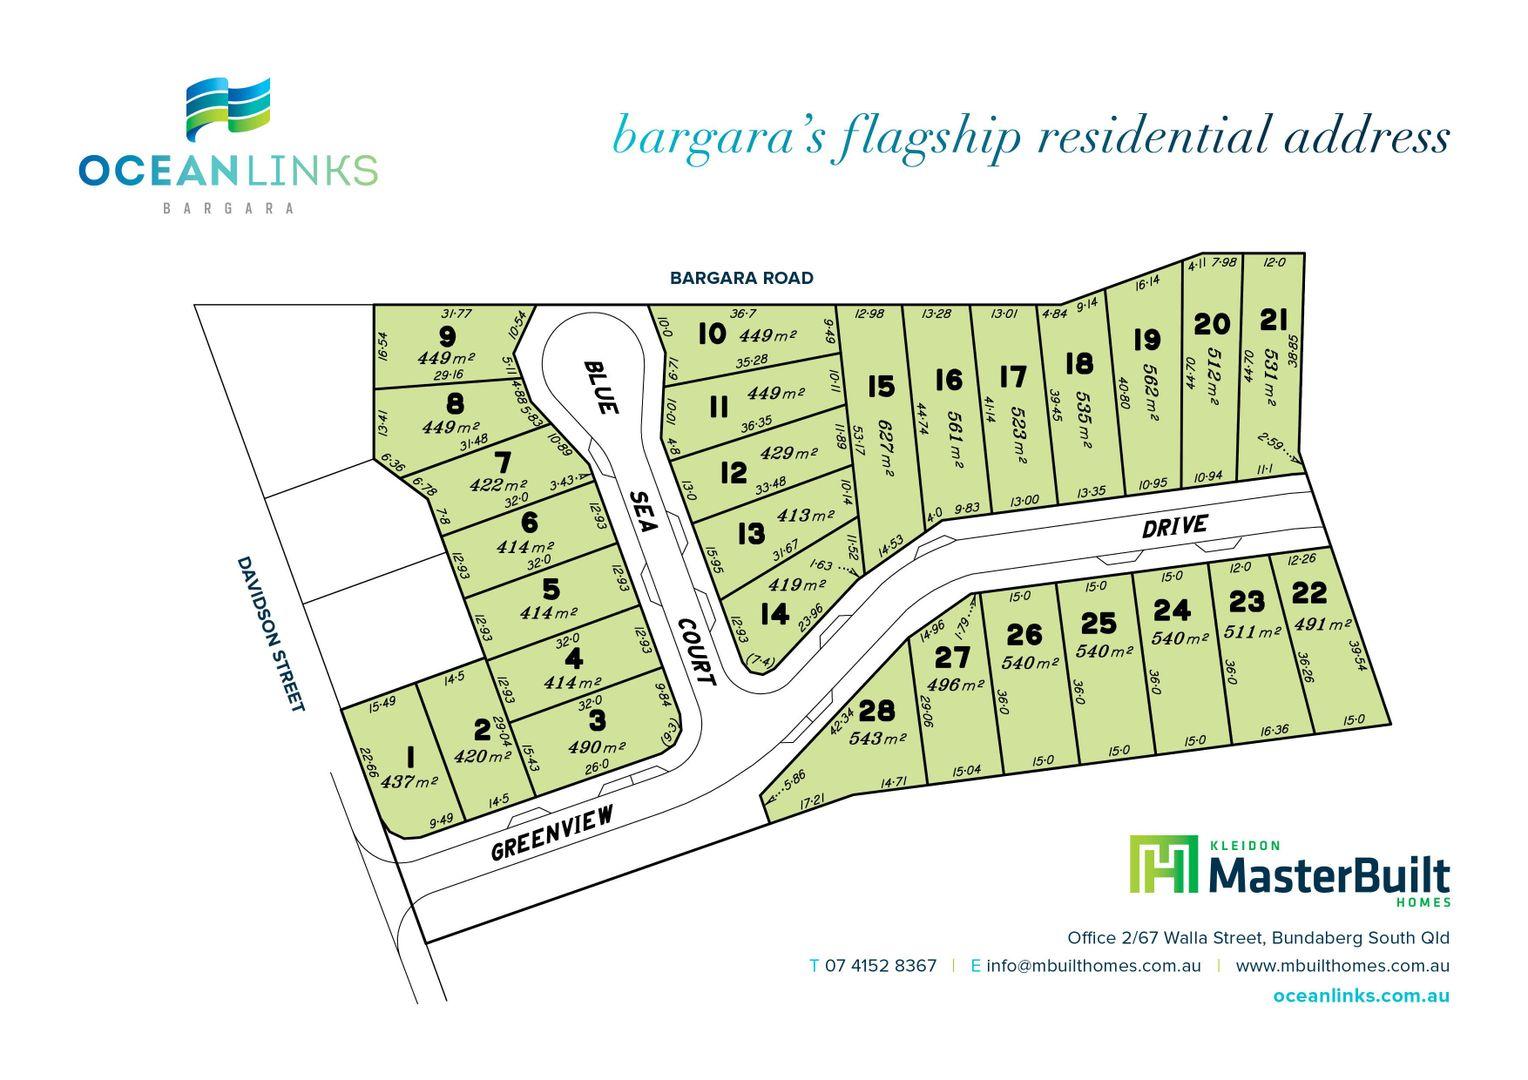 Lot 5 Blue Sea court, Bargara QLD 4670, Image 1